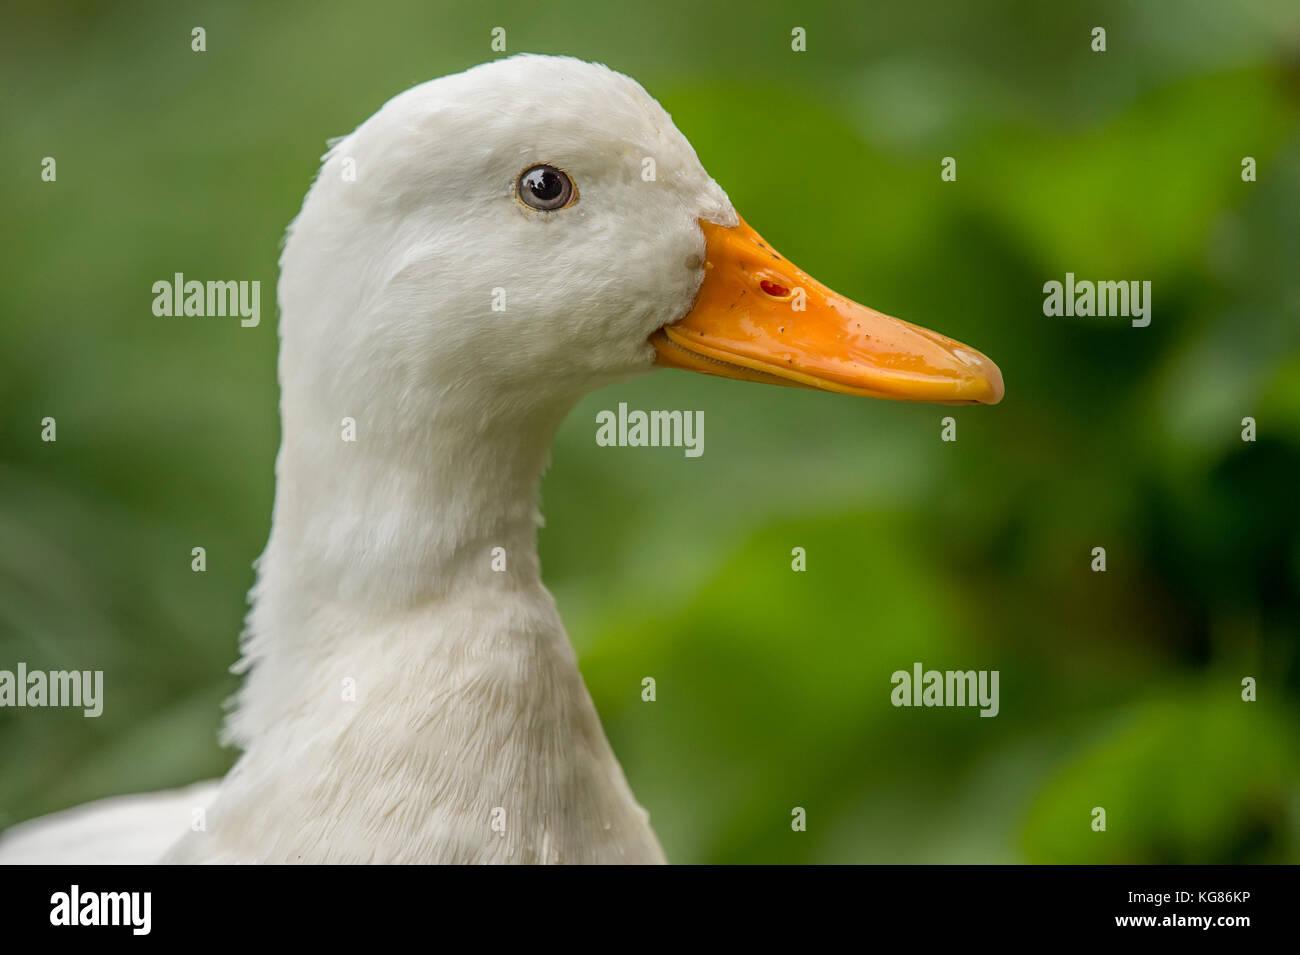 Pekin duck, on a riverbank, close up - Stock Image